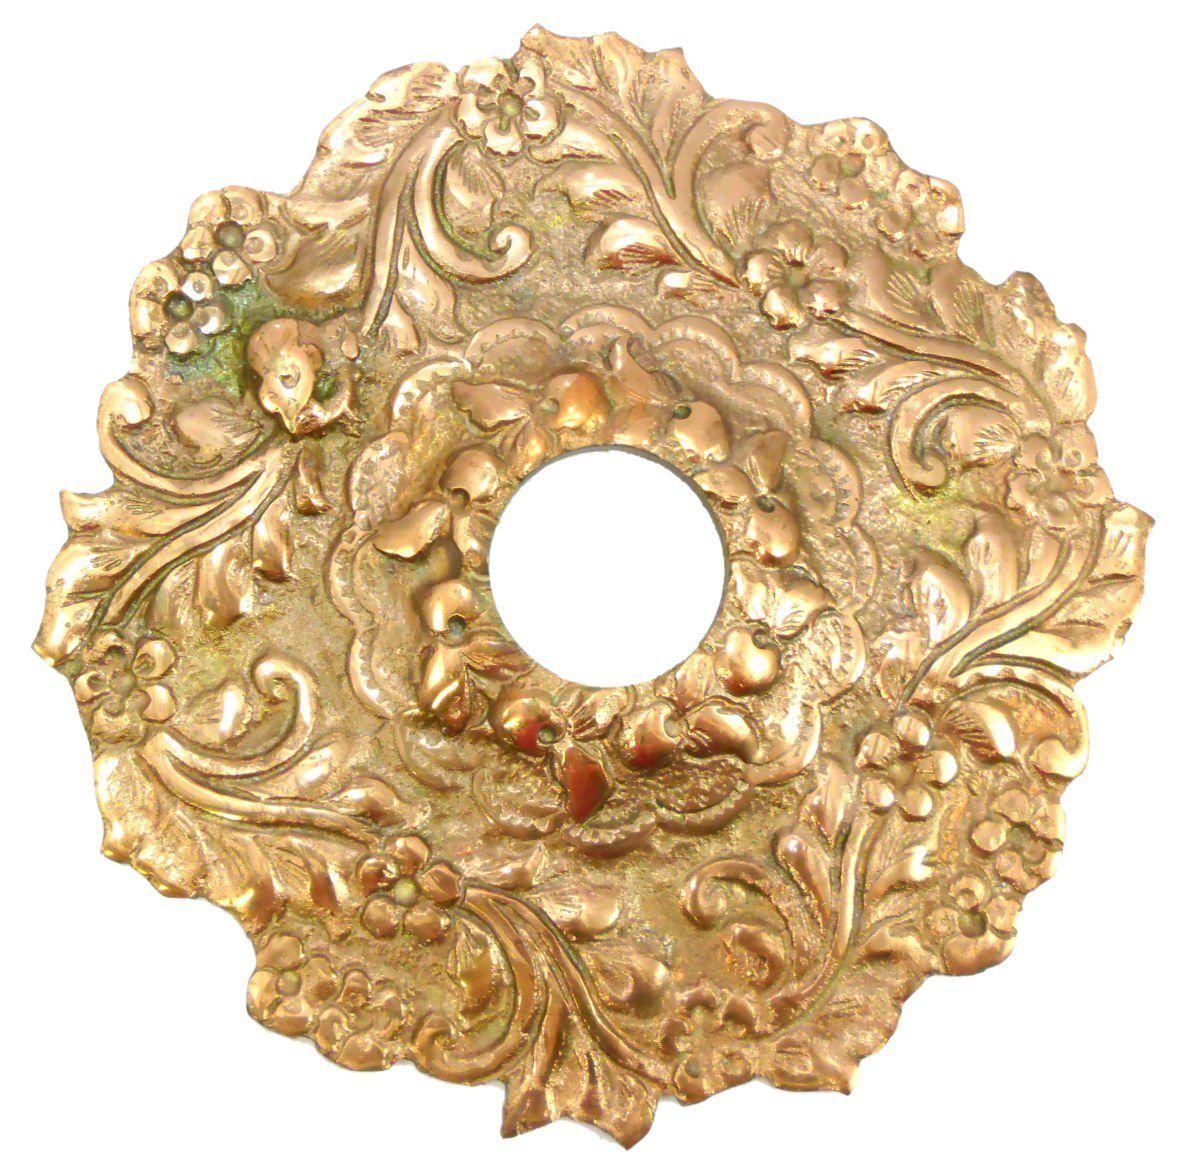 Prato para narguile Turco ROYAL FARIDA floral em bronze, Grande (22cm de diâmetro) 4,5cm de furo.